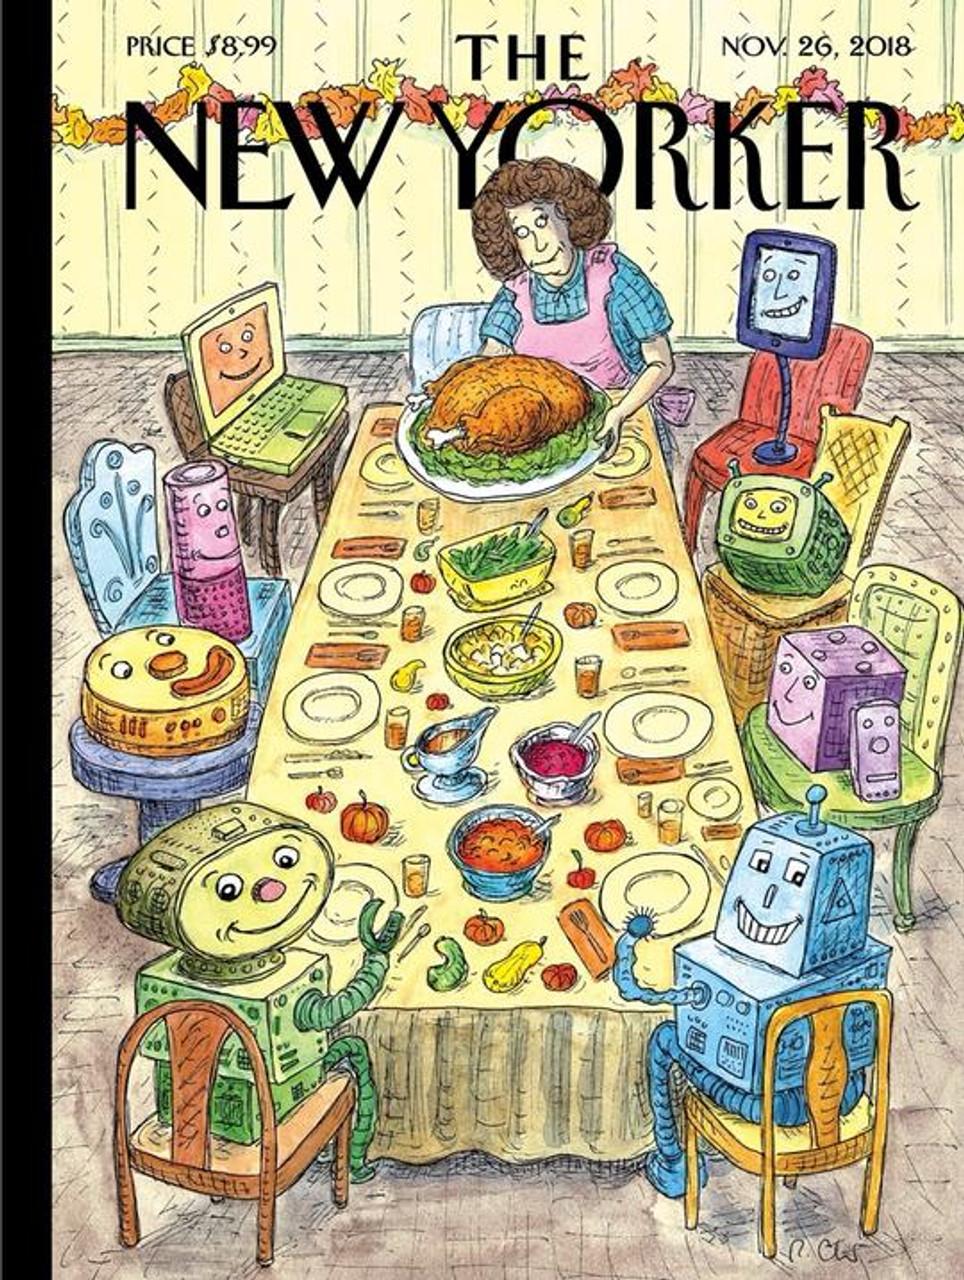 Thankfulness - 1000 pieces - New Yorker